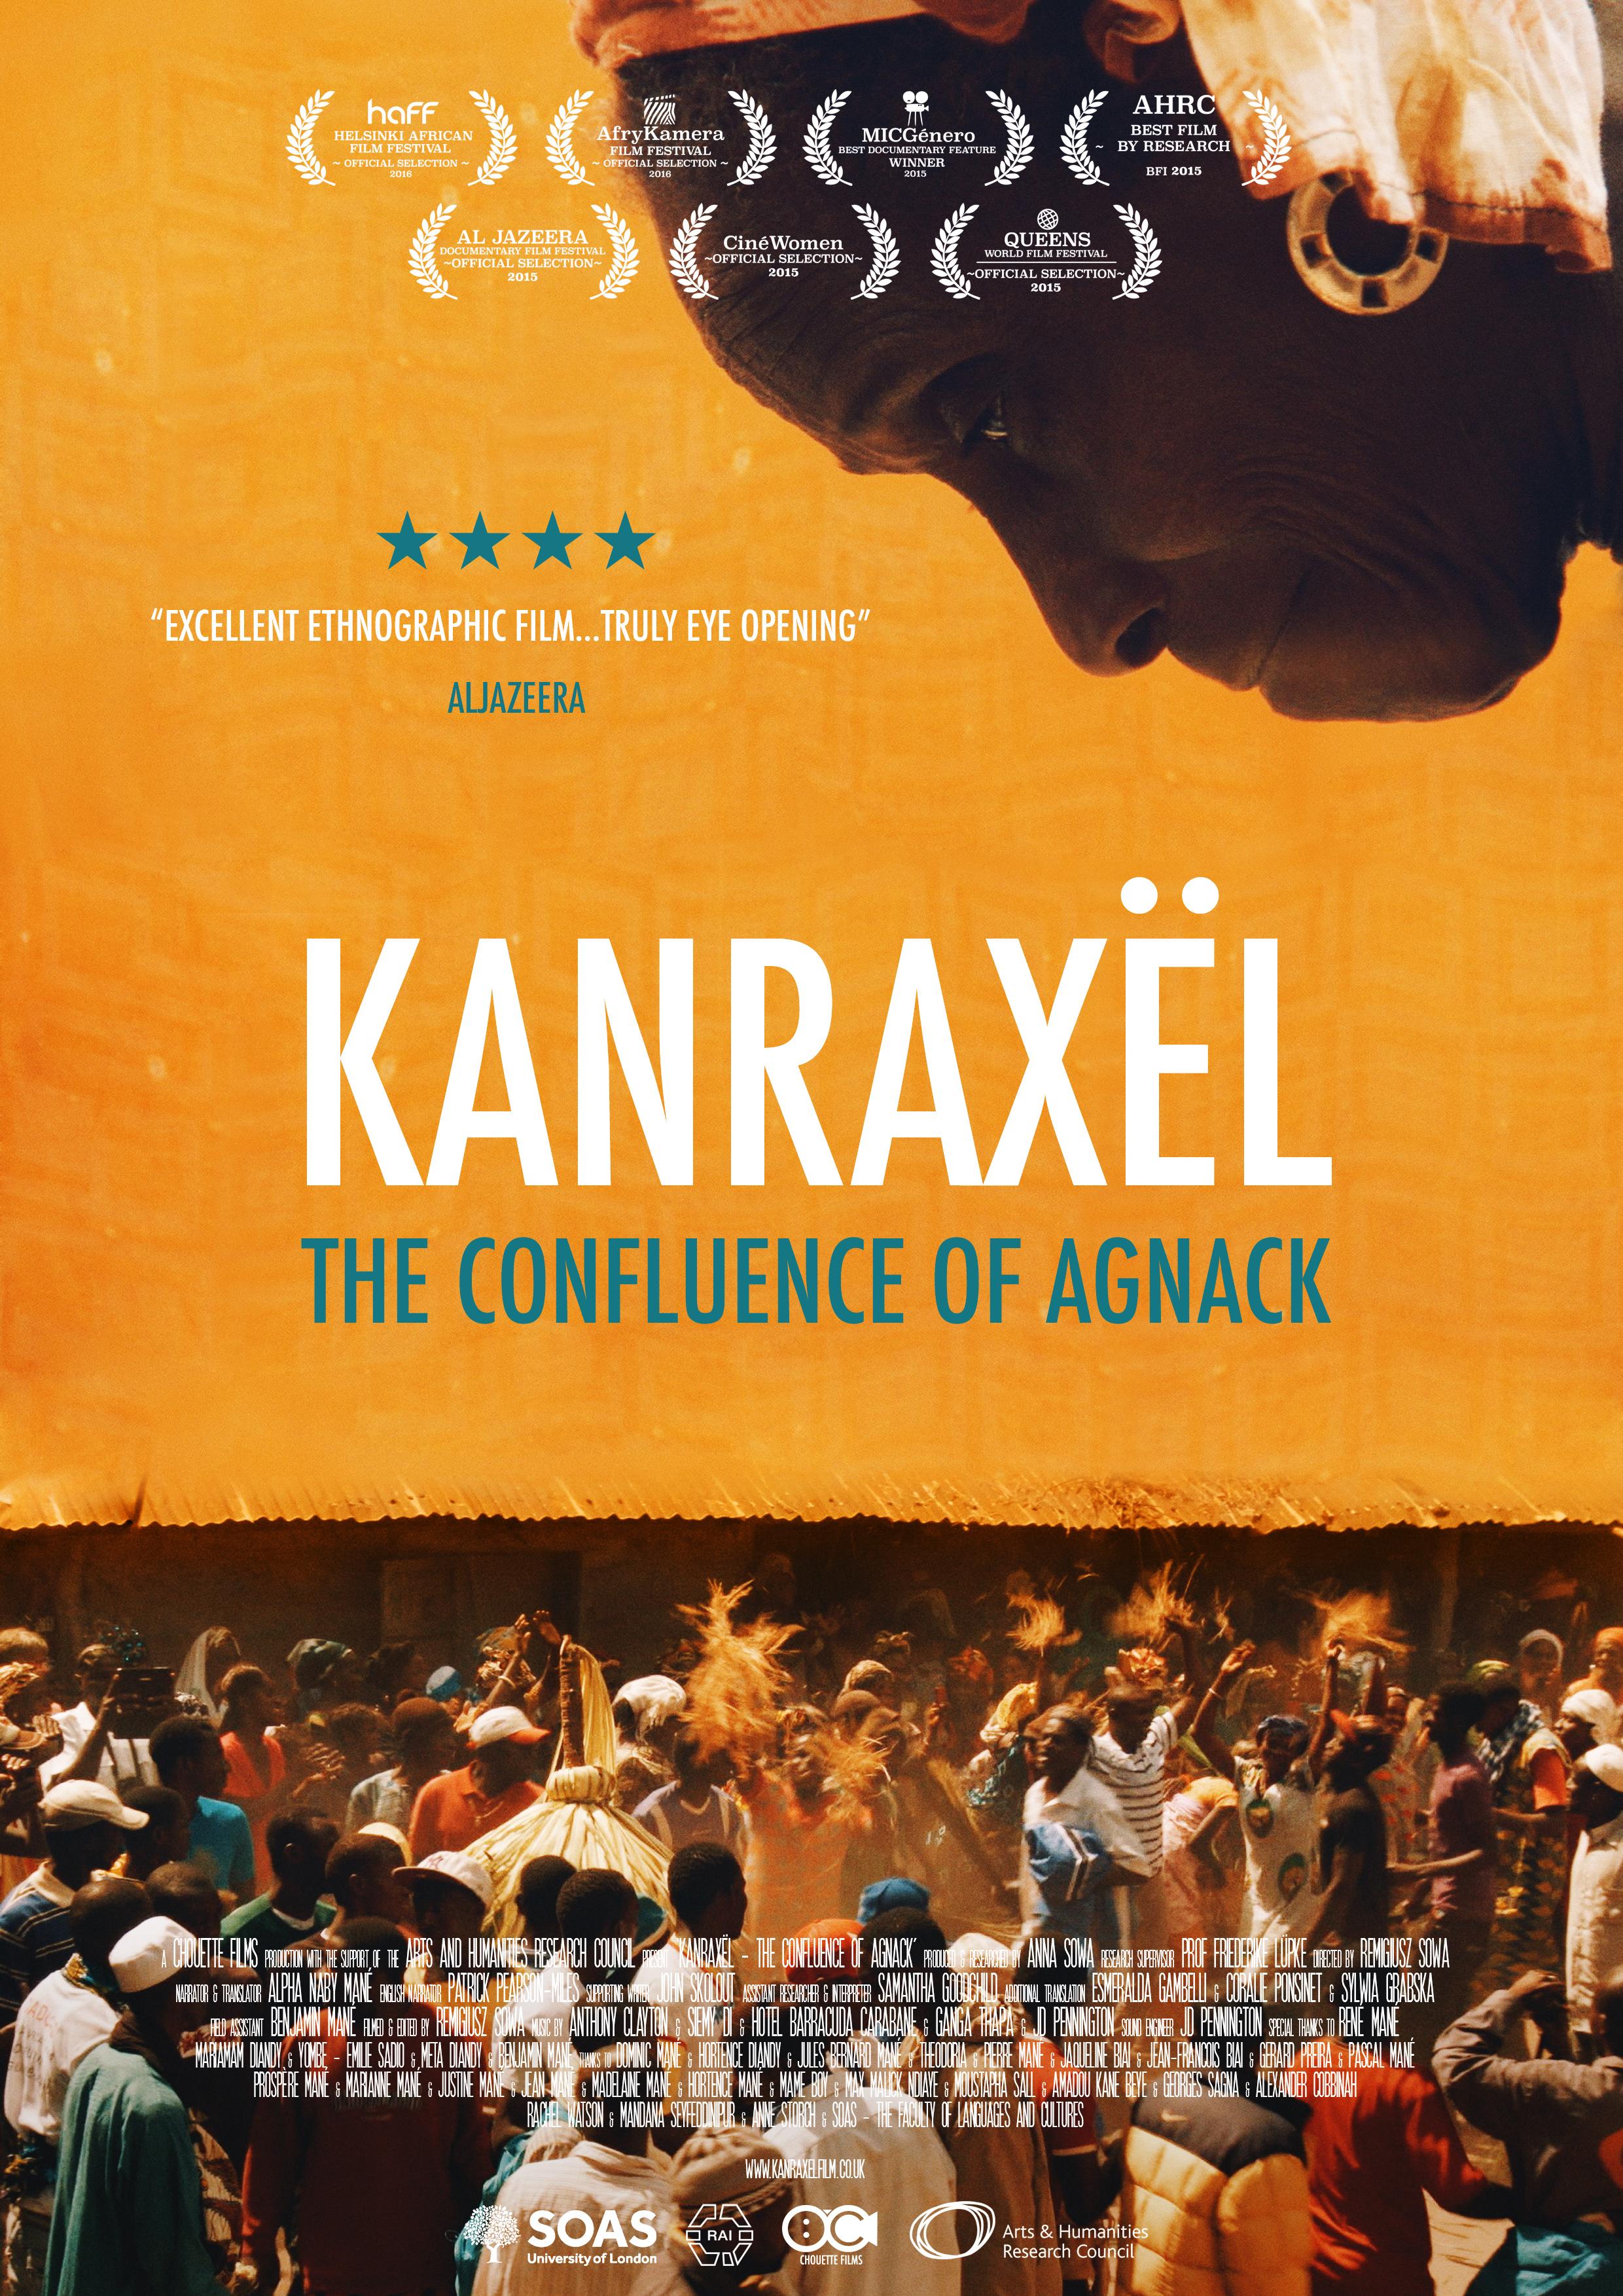 KANRAXËL - THE CONFLUENCE OF AGNACK